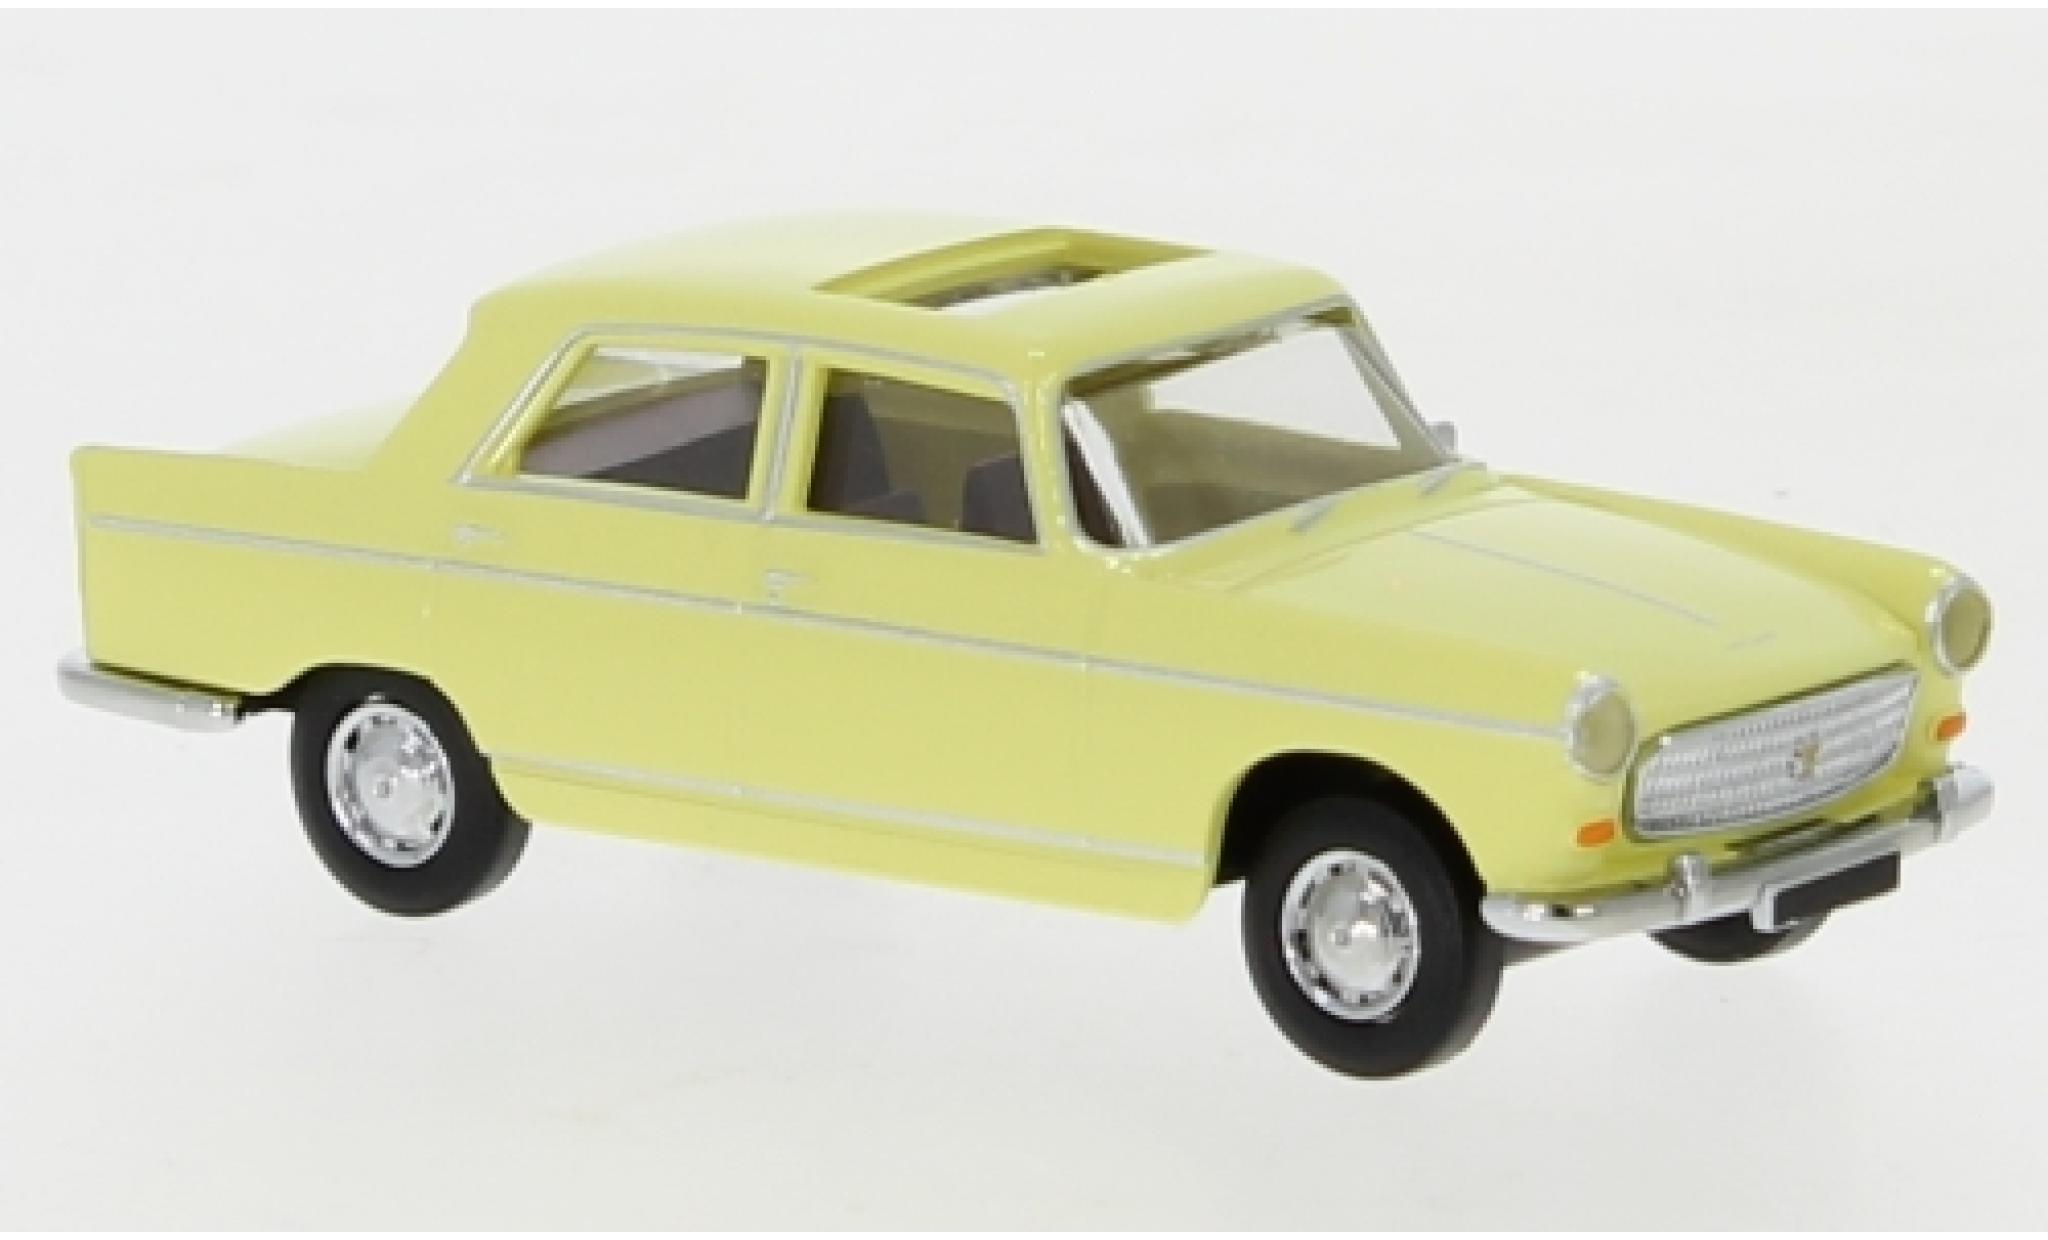 Peugeot 404 1/87 Brekina yellow 1961 toit ouvrant ouvert